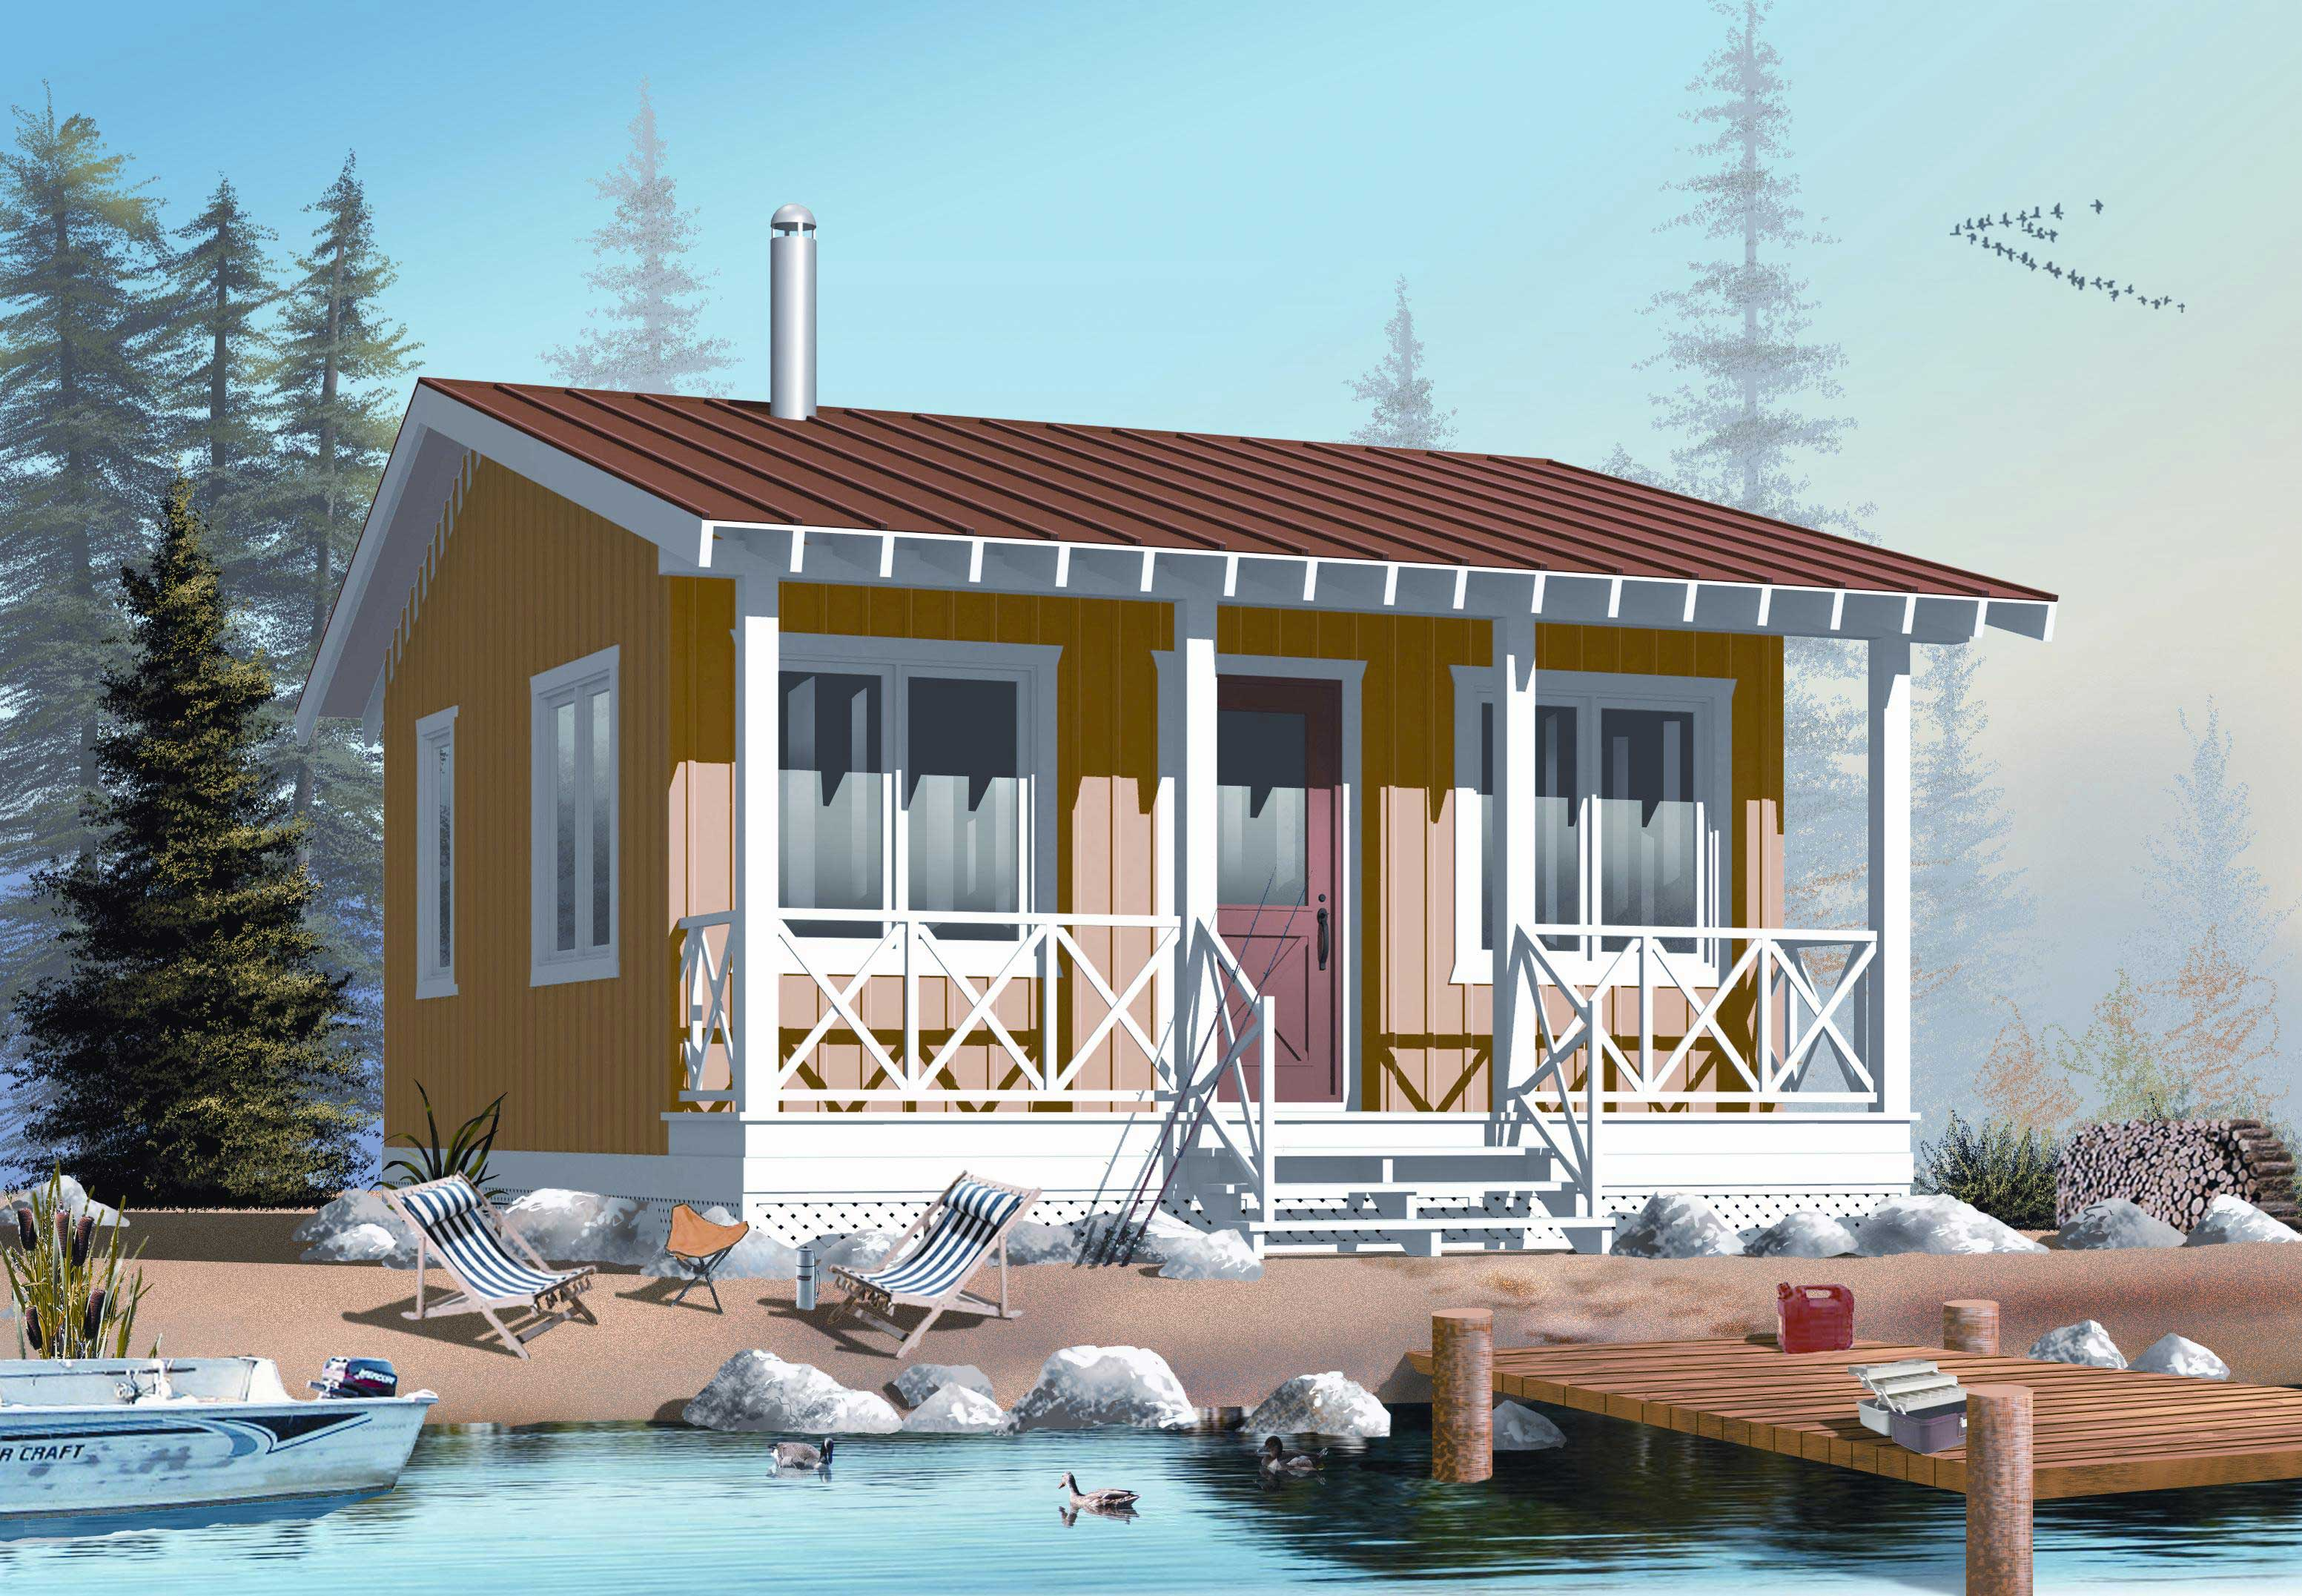 Small House Plan Tiny Home 1 Bedrm 1 Bath 400 Sq Ft